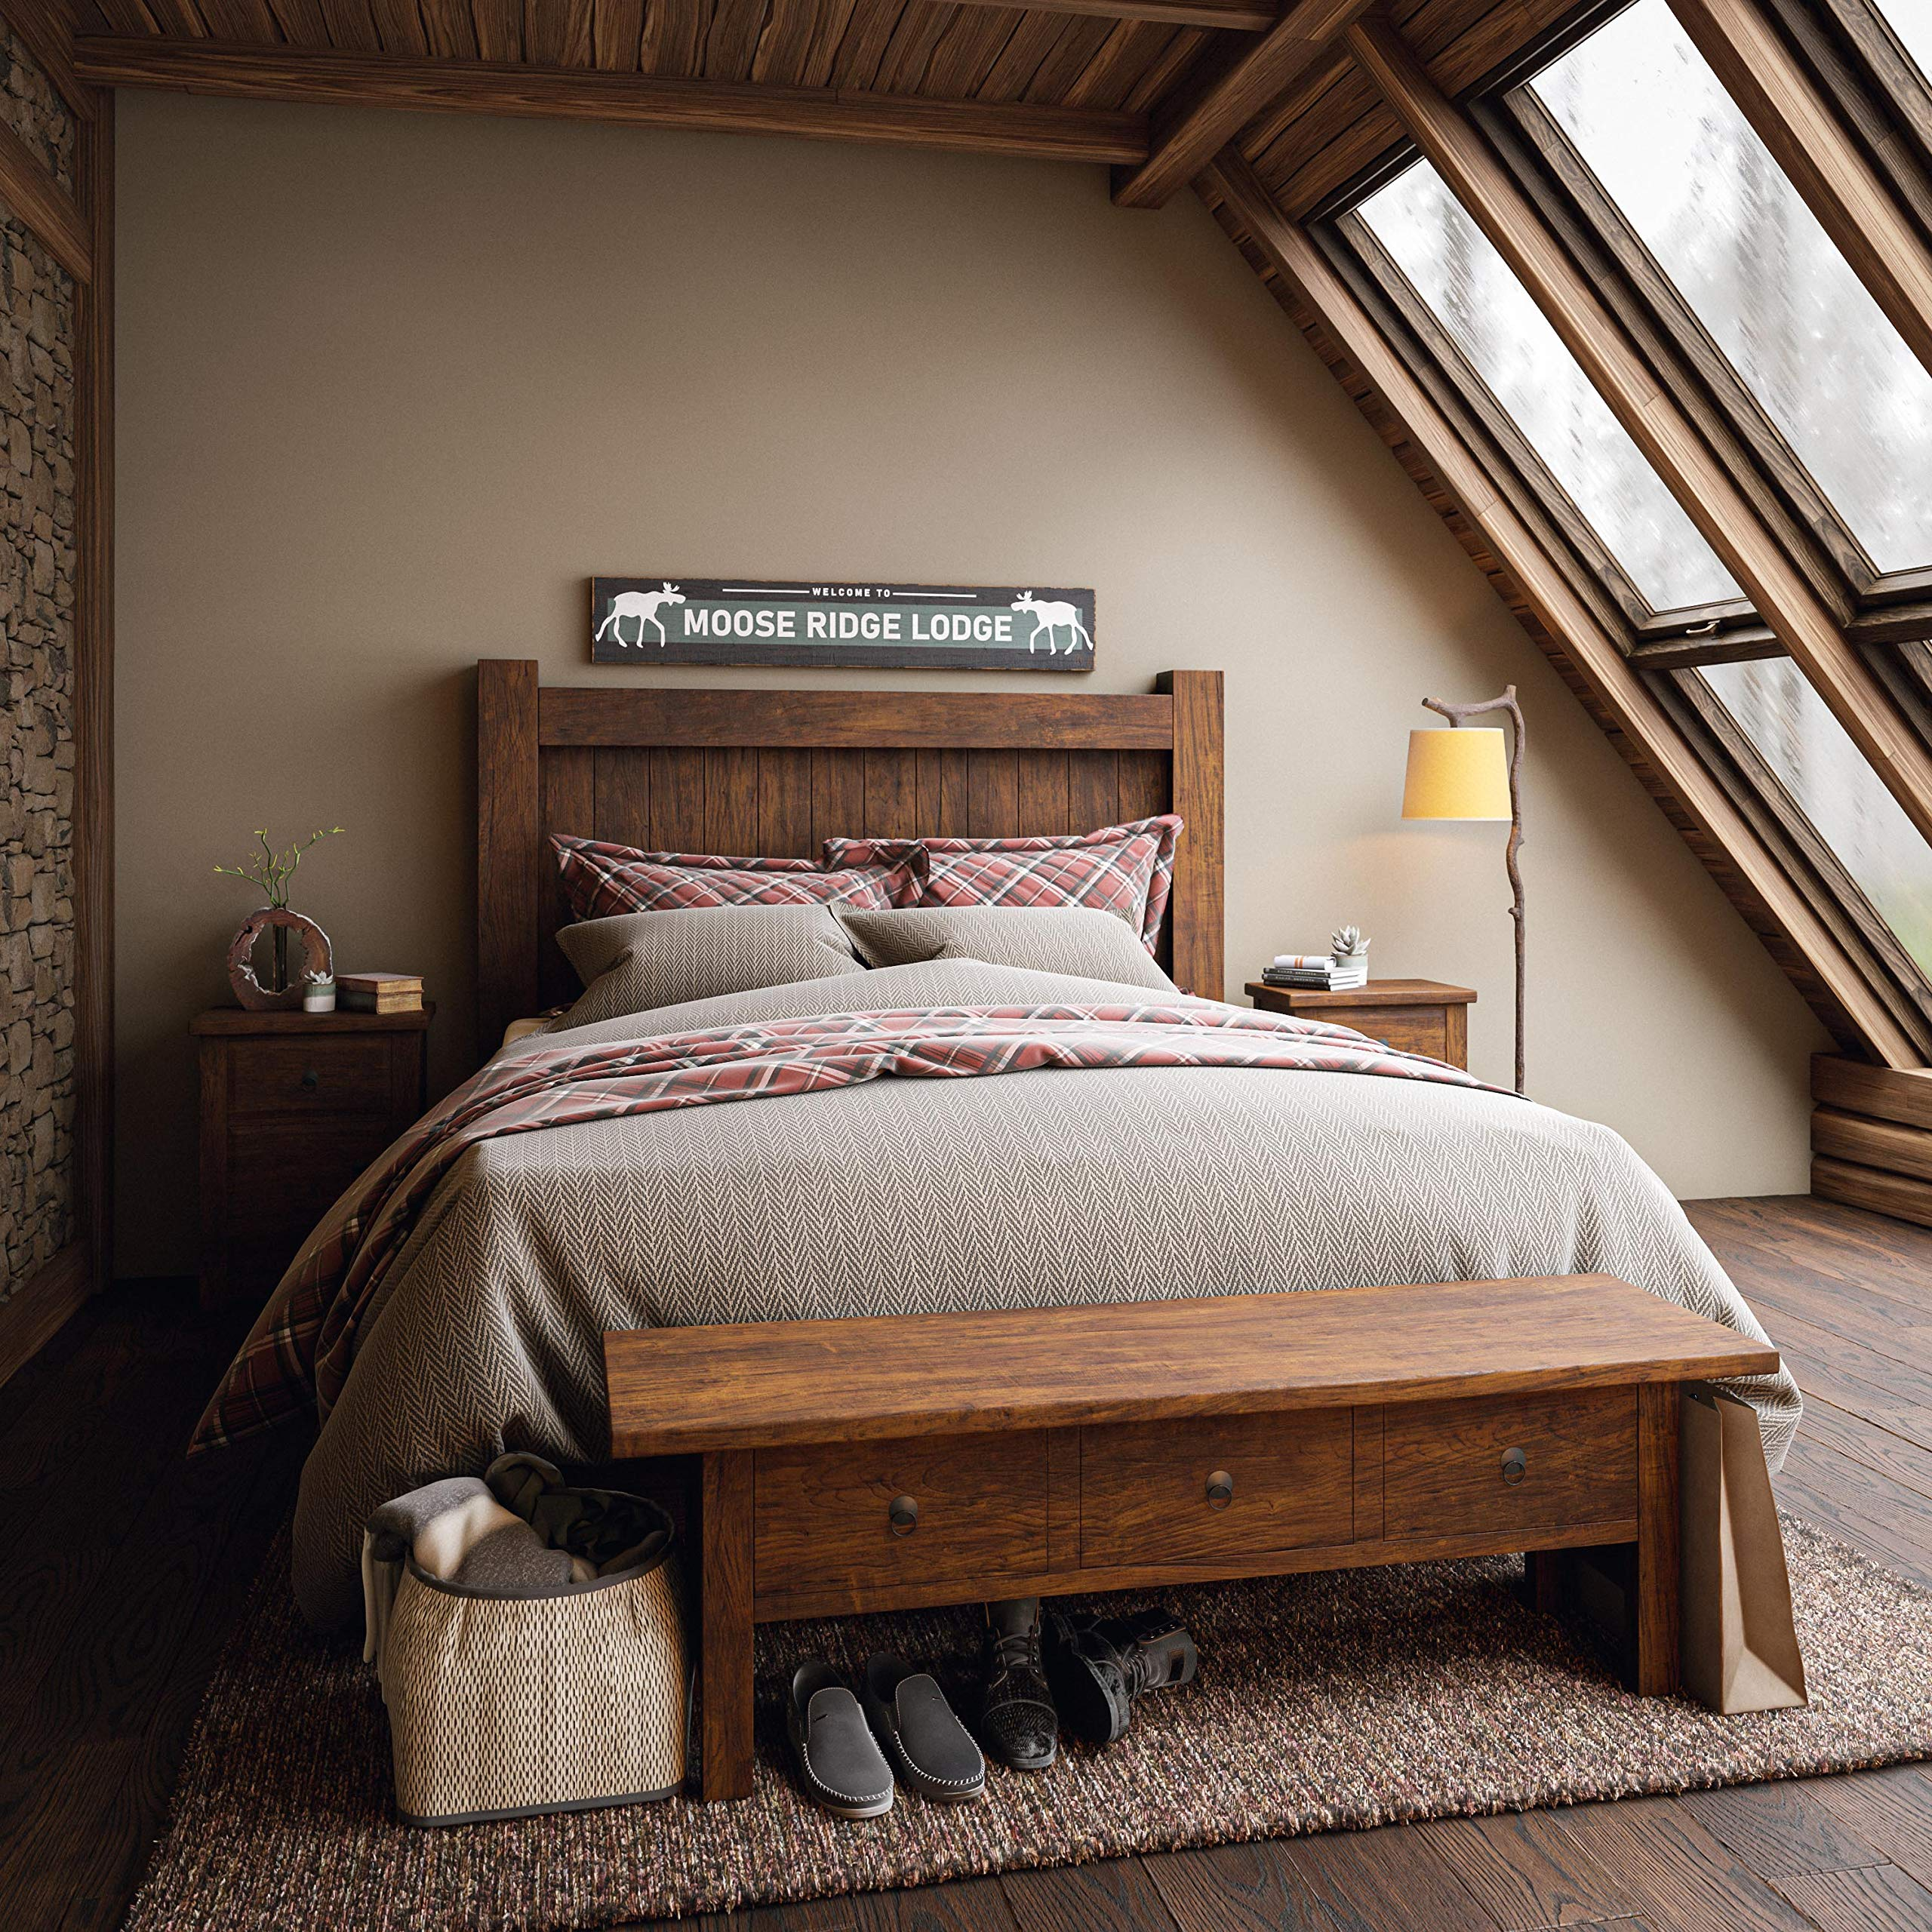 Kenroy-Home-32452BRZD-Rustic-Floor-Lamp.-1 15 Unique Artistic Floor Lamps to Light Your Bedroom